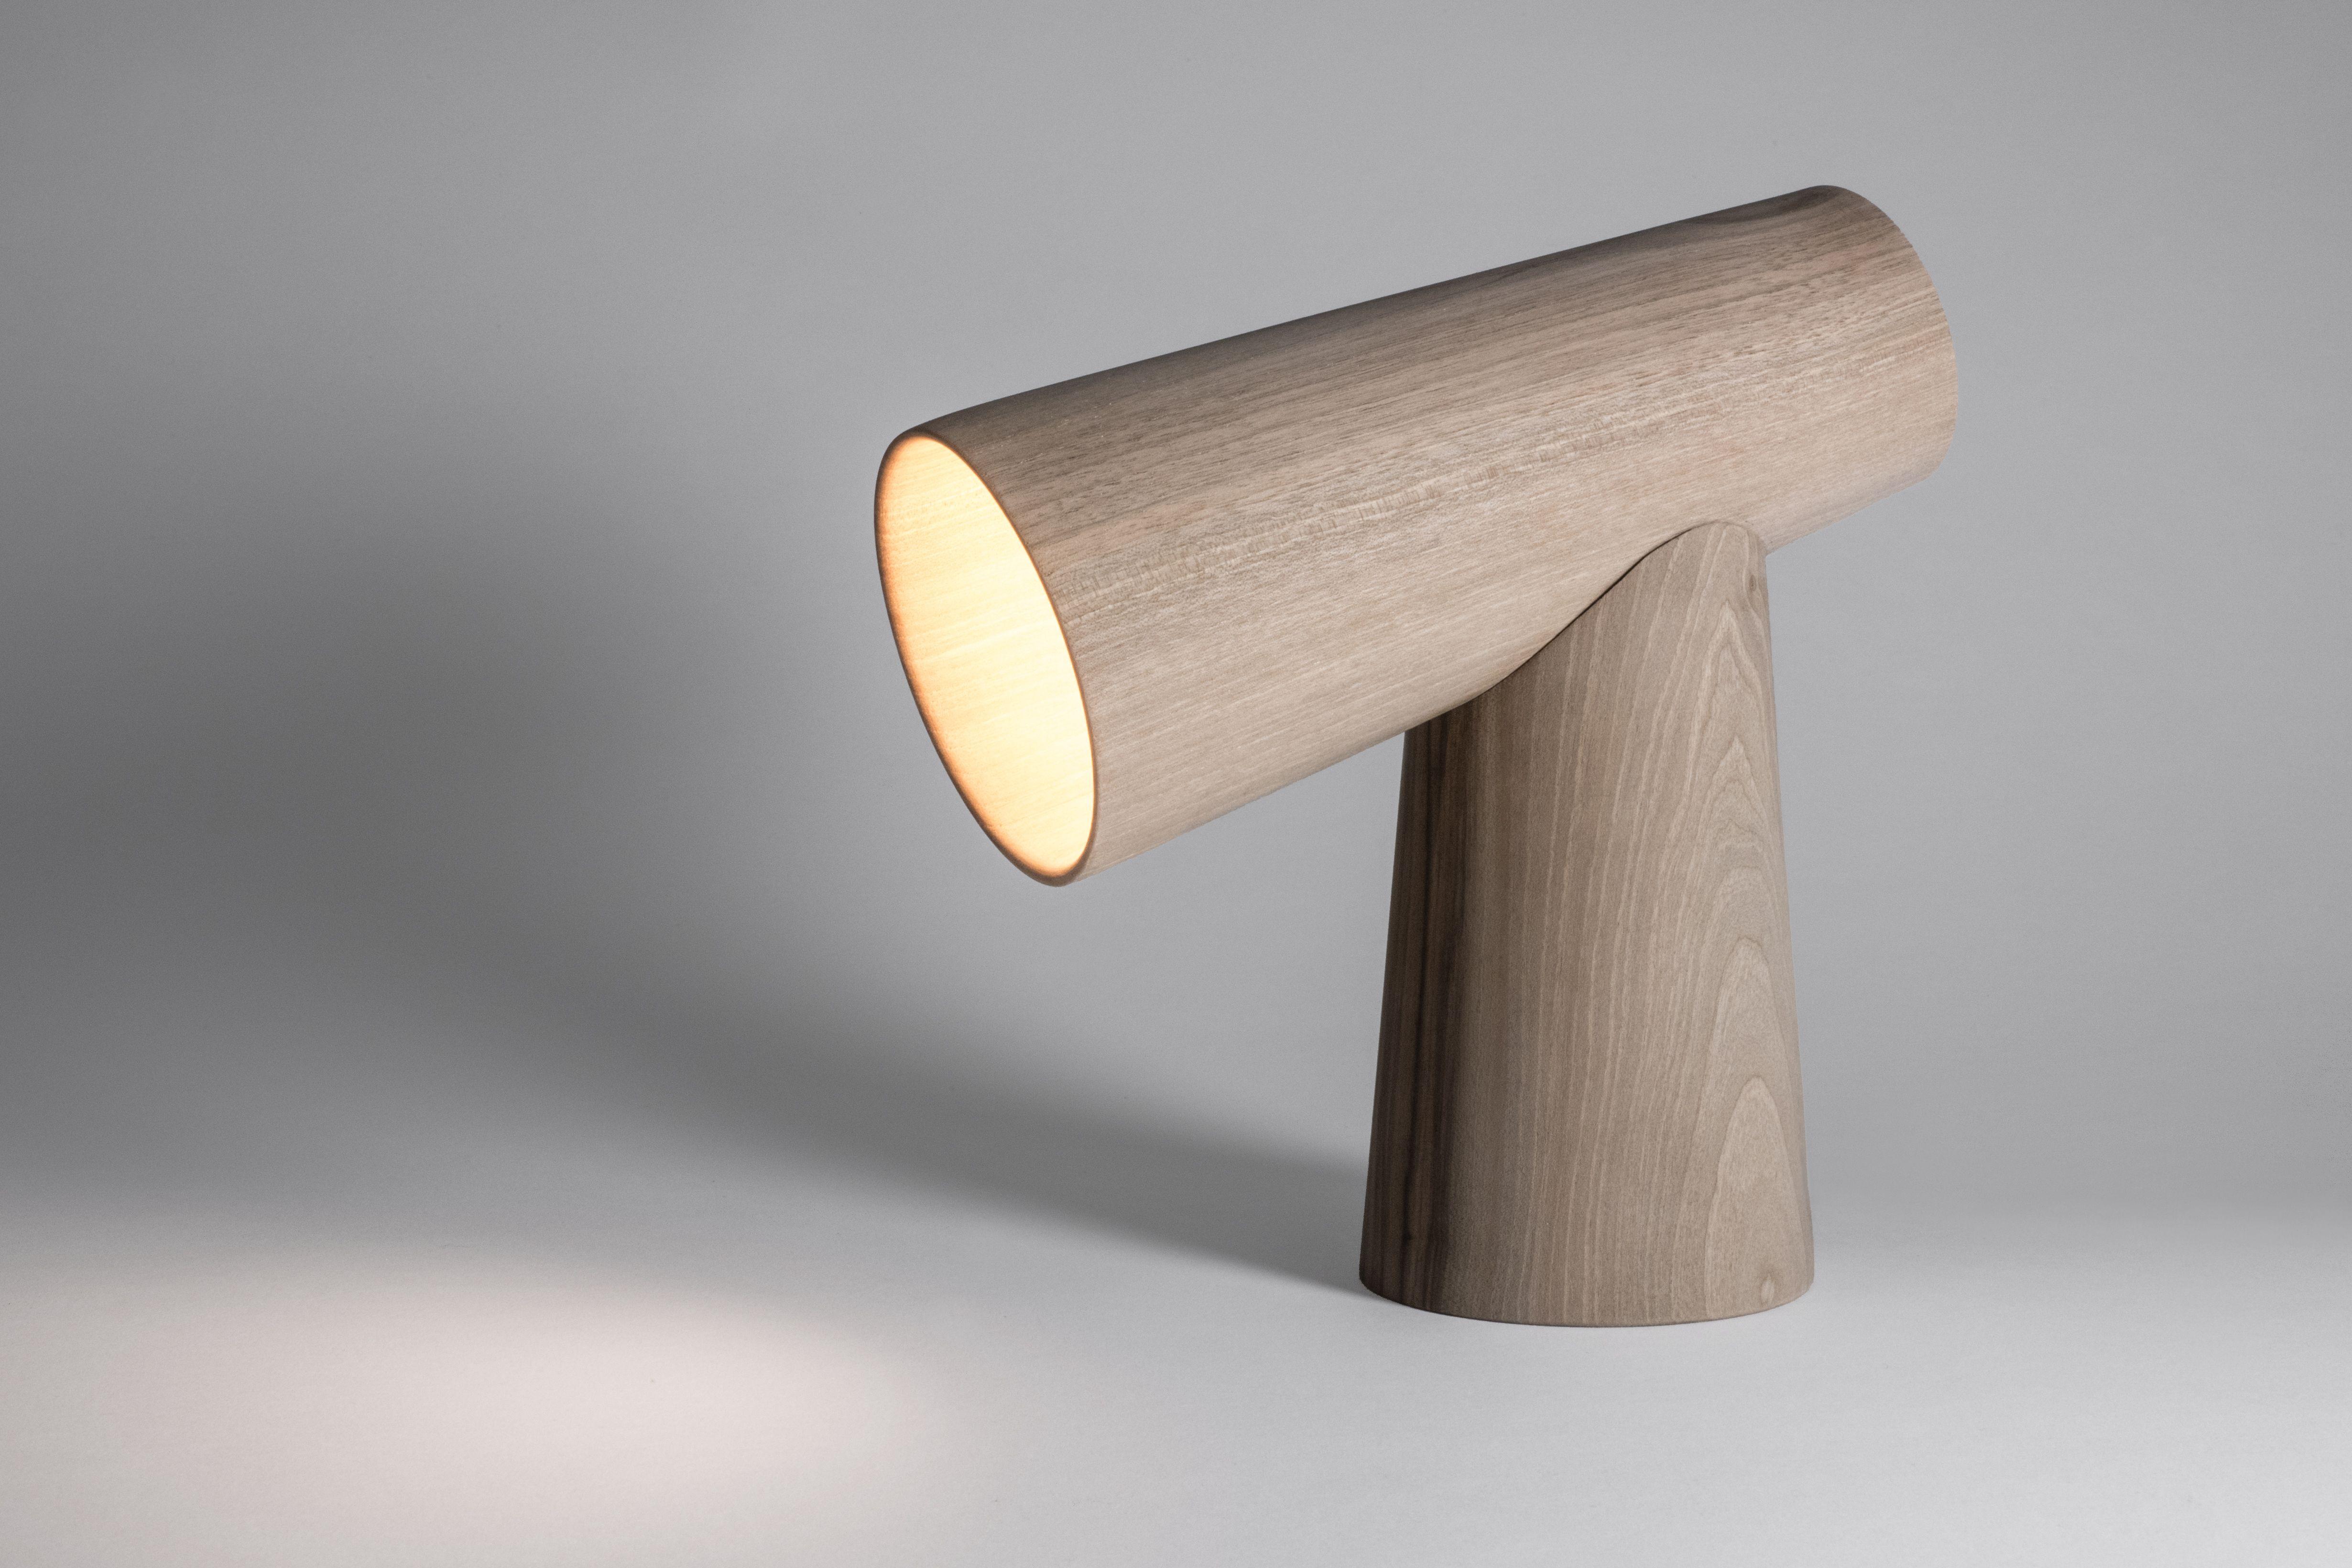 Lampe En Bois Design By Marco Marino Tournevire Lab Marcomarino